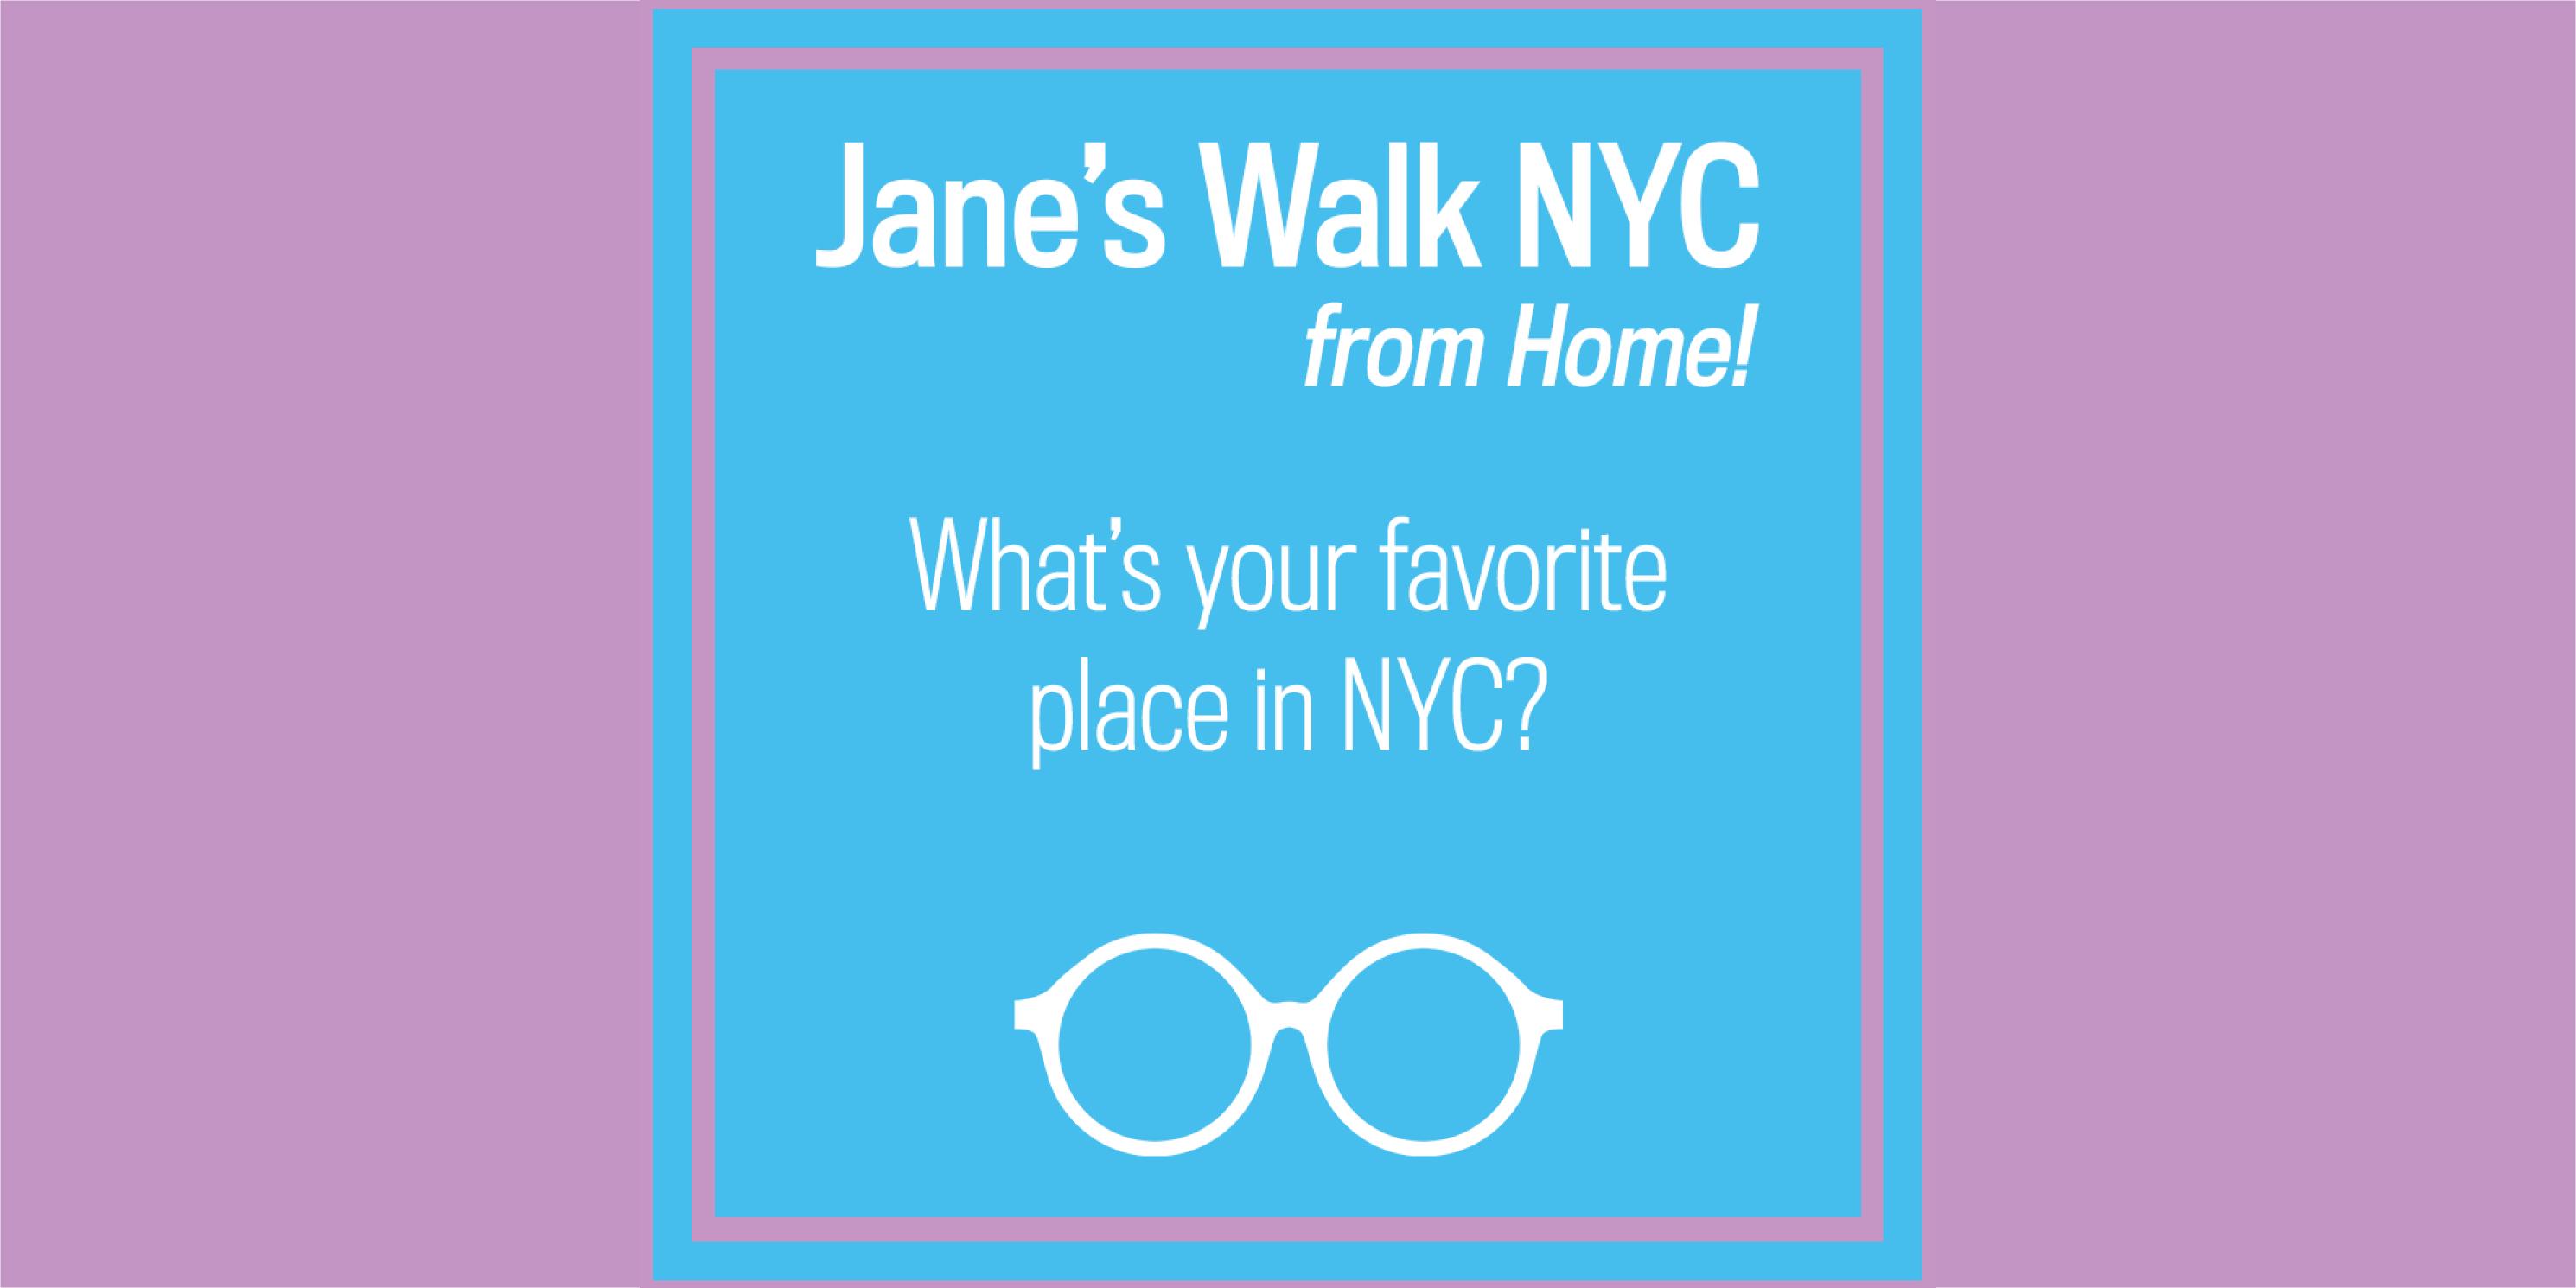 Advertisement for Jane's Walk 2020, Day 1 activities